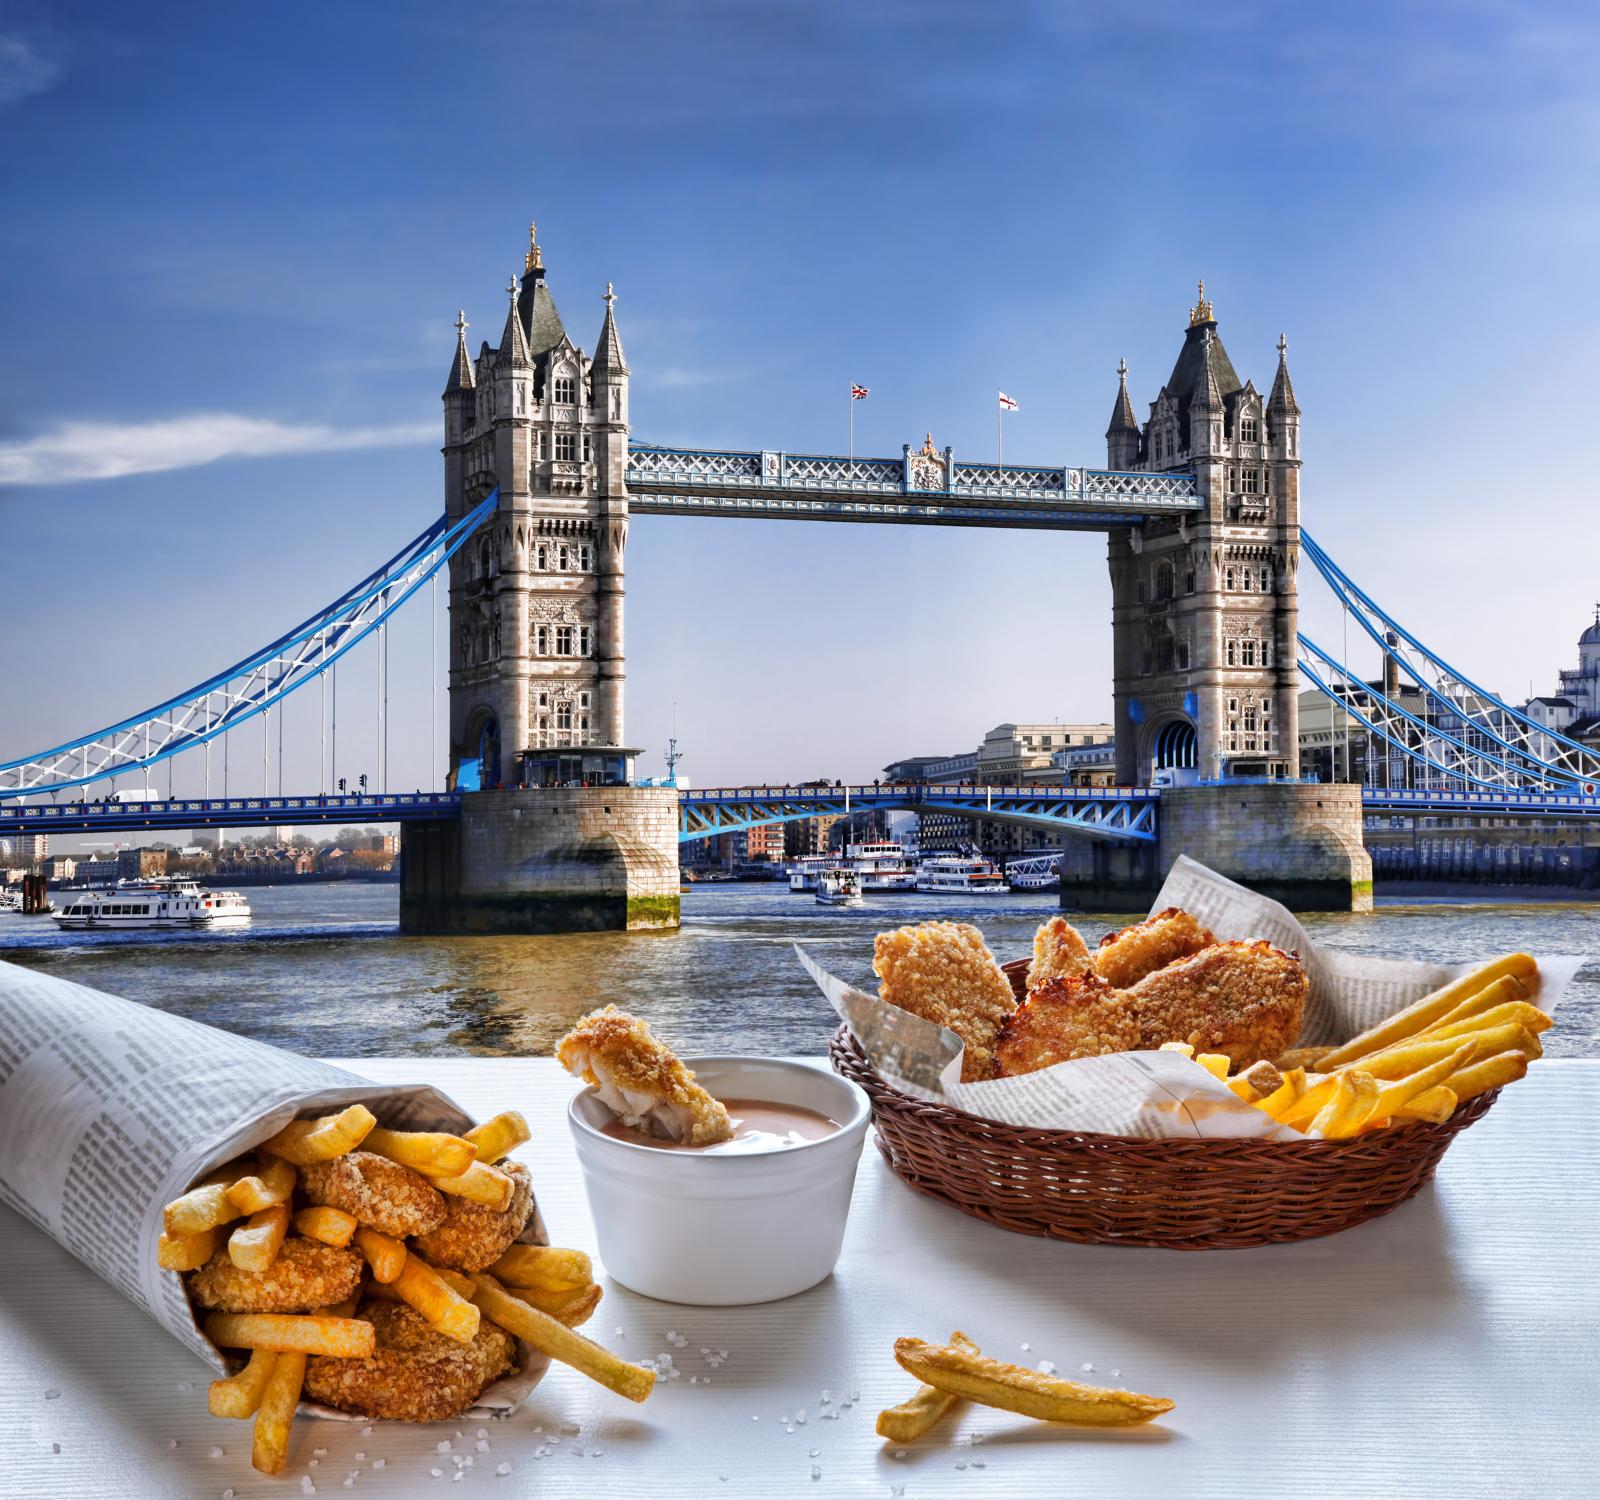 Tower Bridge, Londra, fish and chips